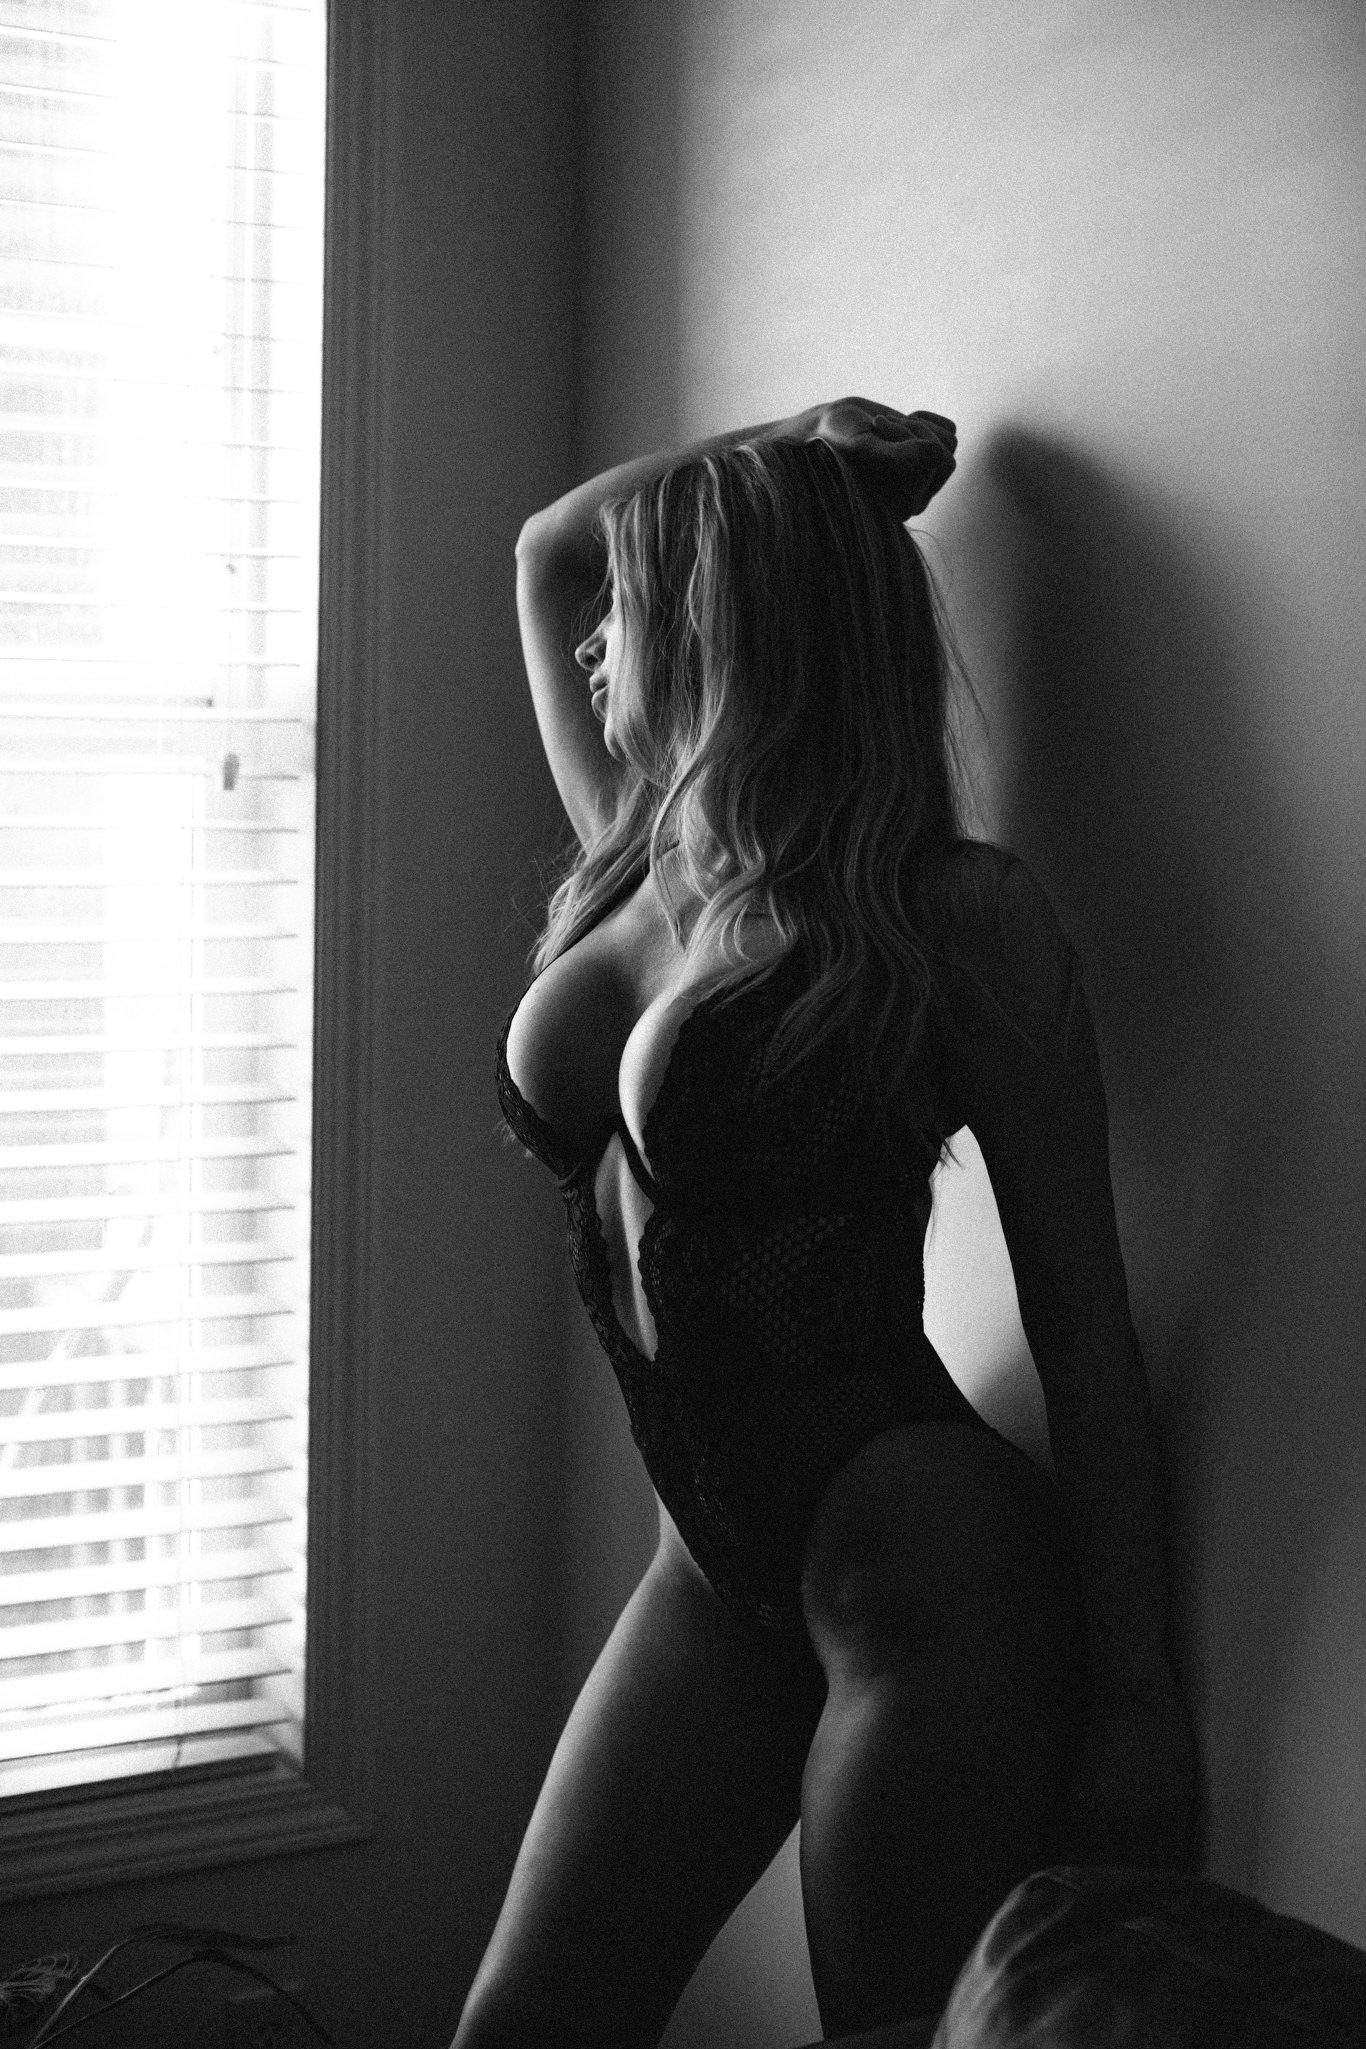 calgary-boudoir-photoshoot-winner-8